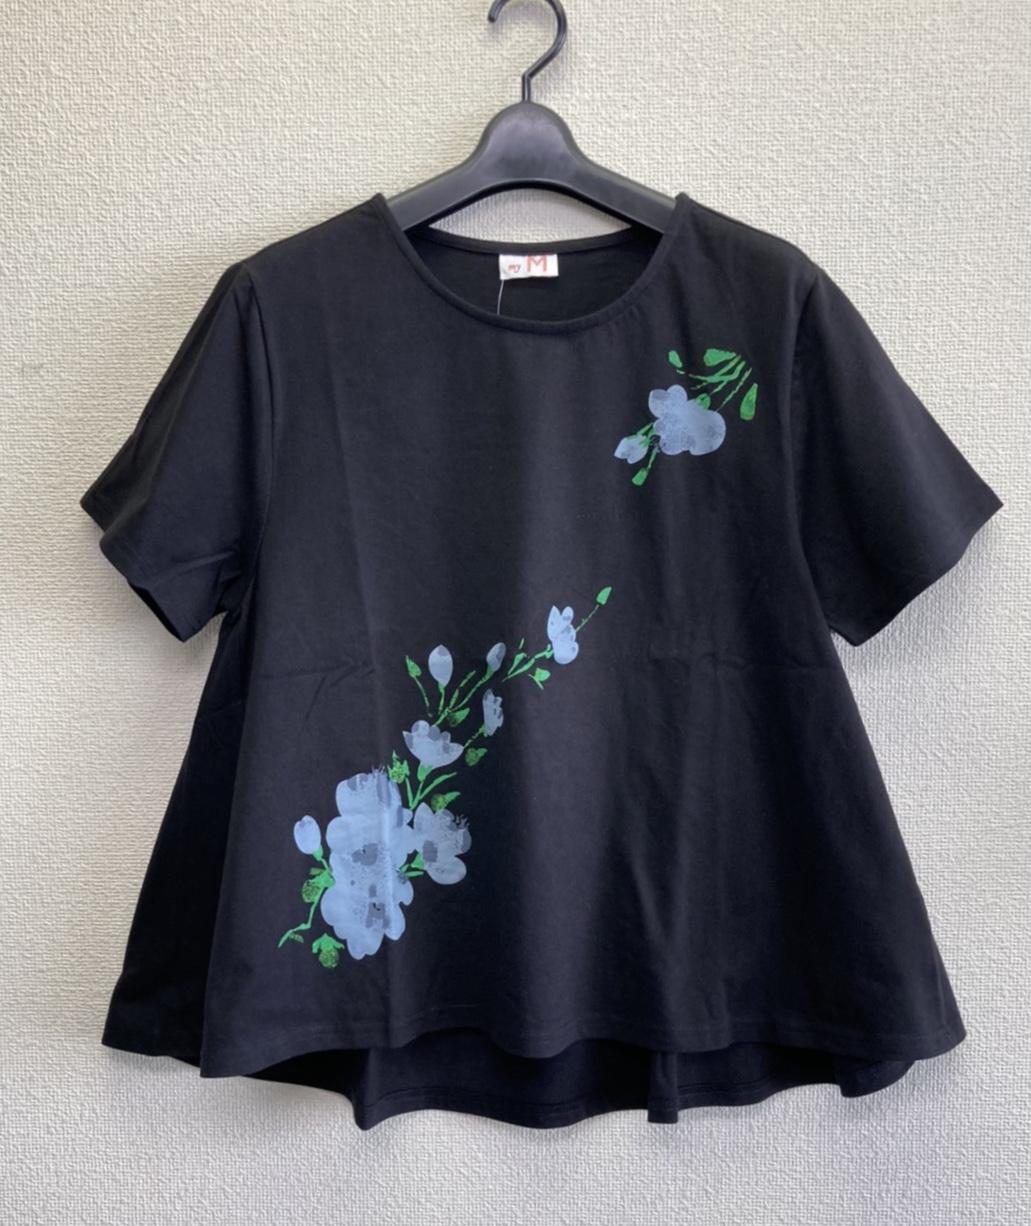 myM_1217_Tshirts_black